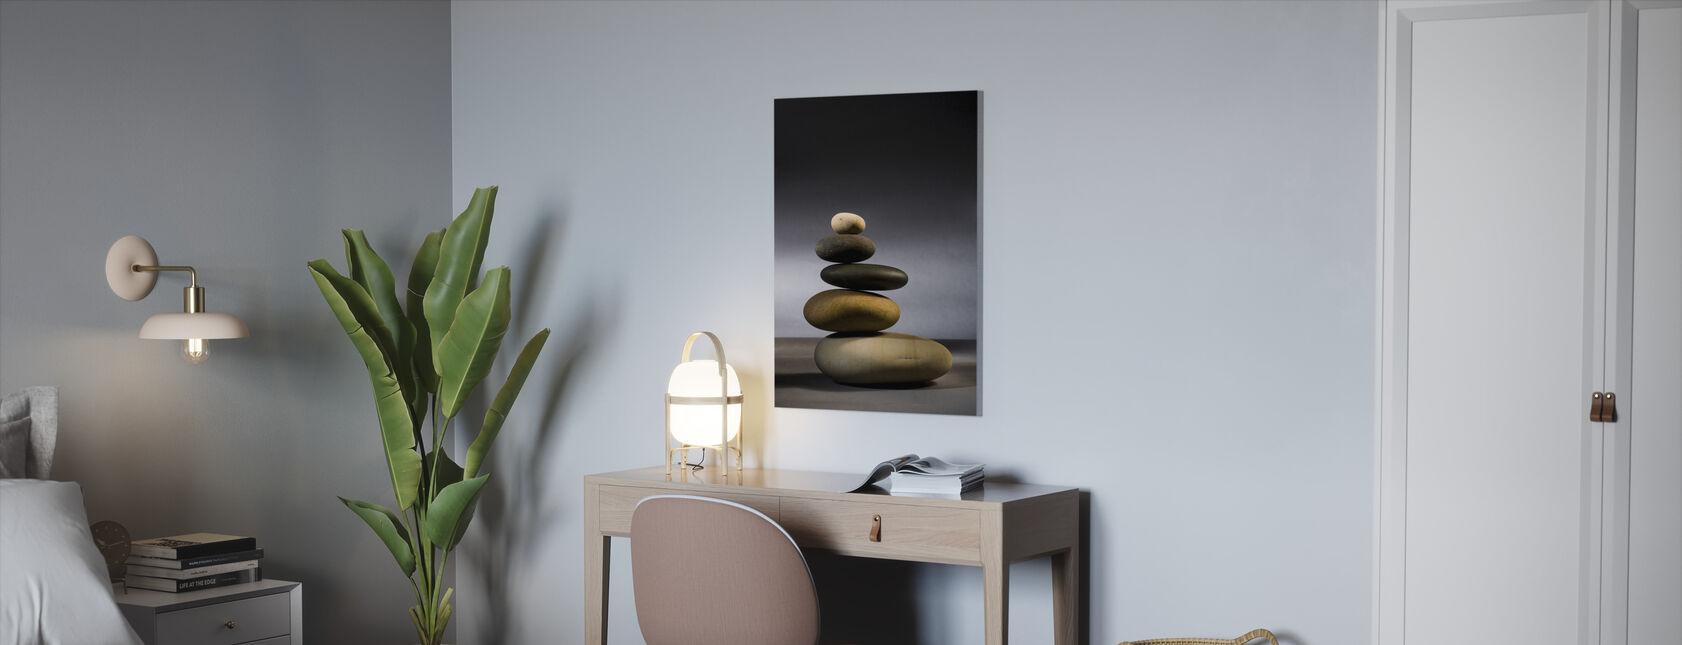 Steiner i Zen-balanse - Lerretsbilde - Kontor